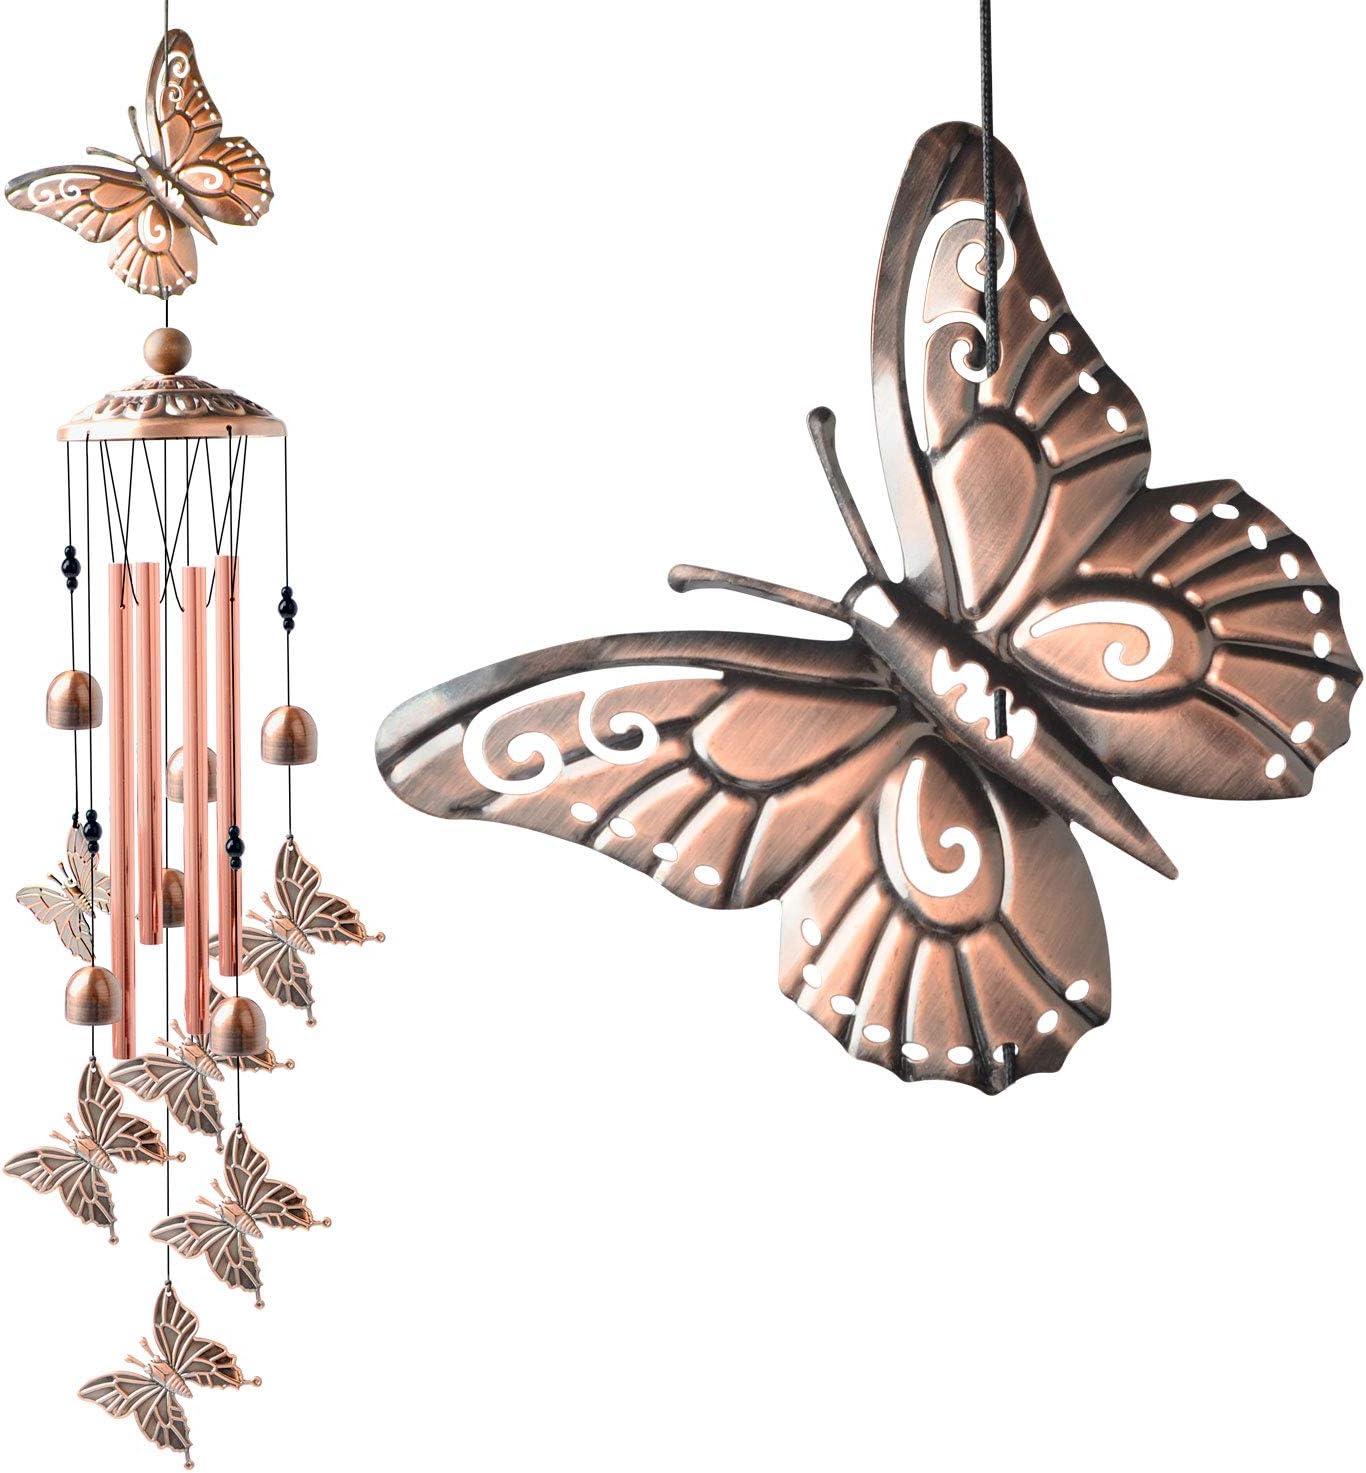 ShangTianFeng Butterfly Wind Chimes Retor Garden Decor Wedding Gift Best Mom Birthday Gift Metal Romantic Housewarming Gift Butterfly Windchimes